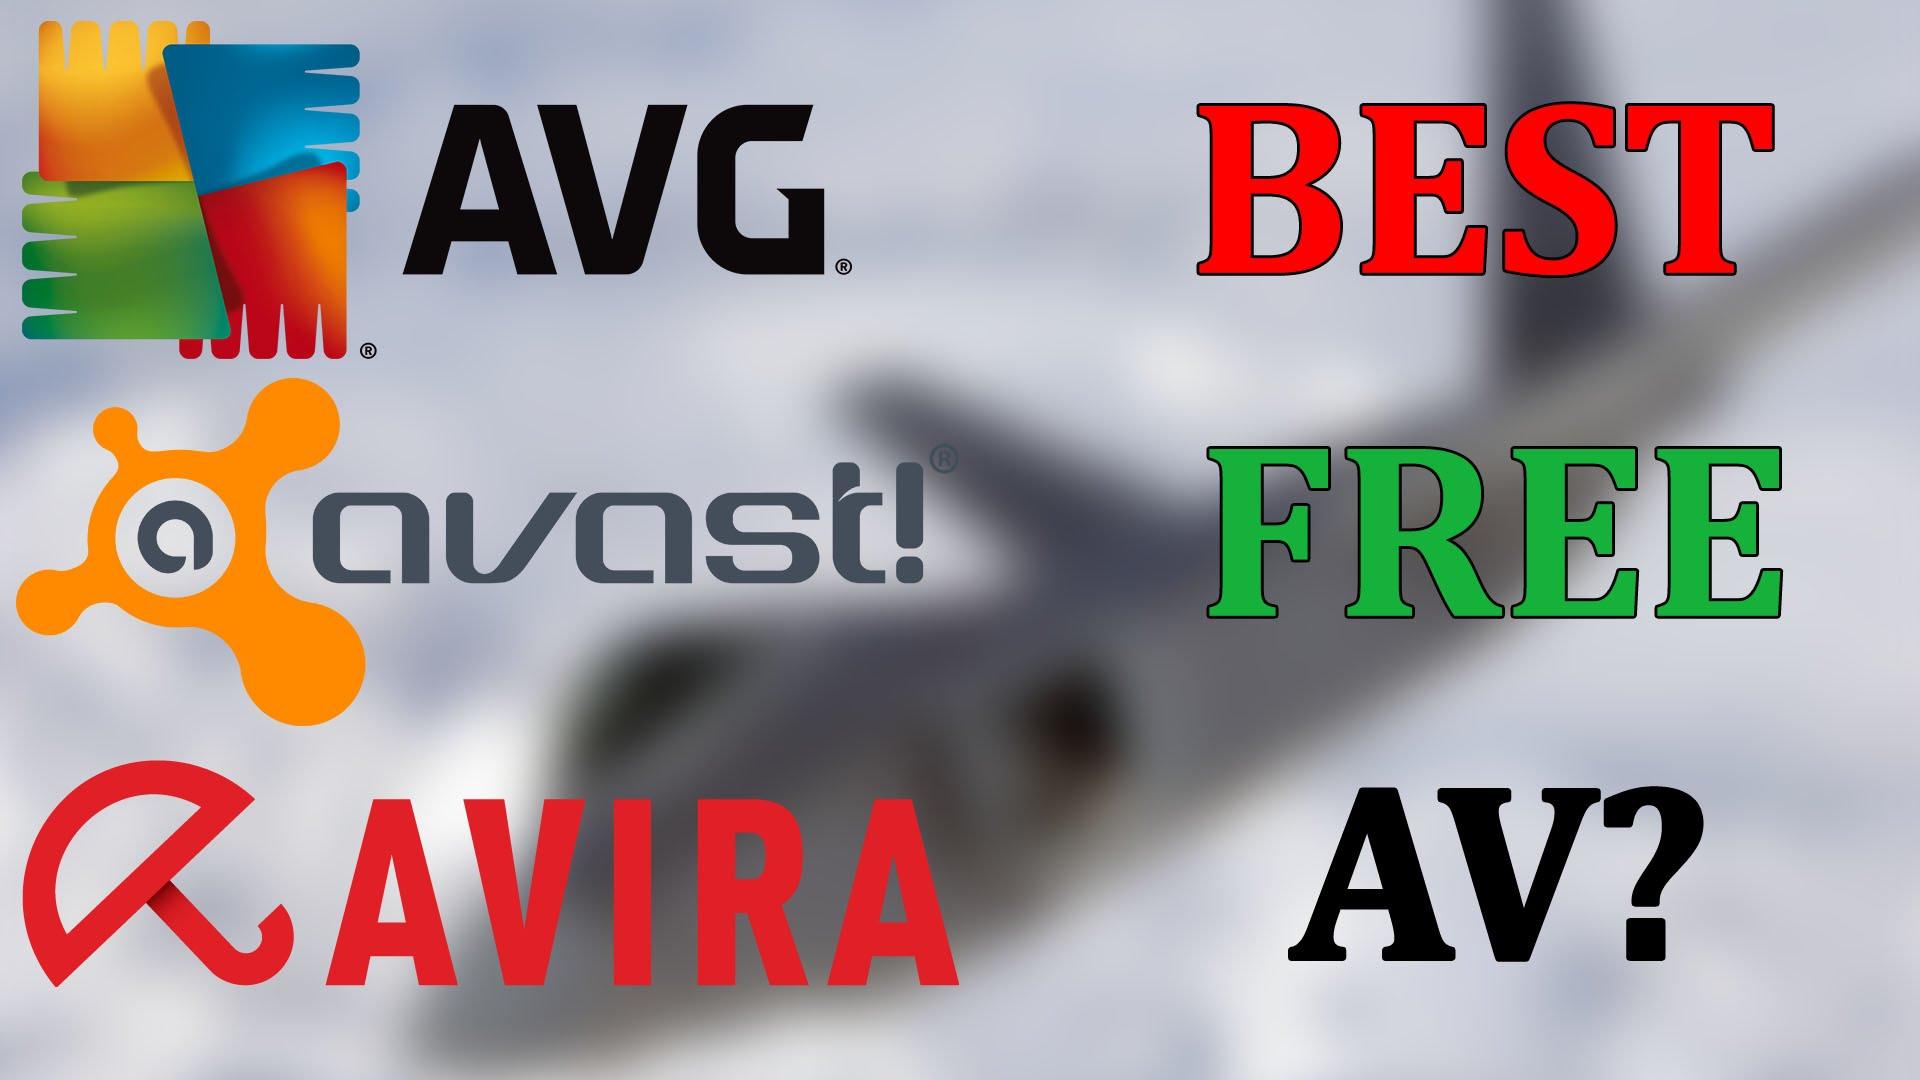 AVG Avast or Avira